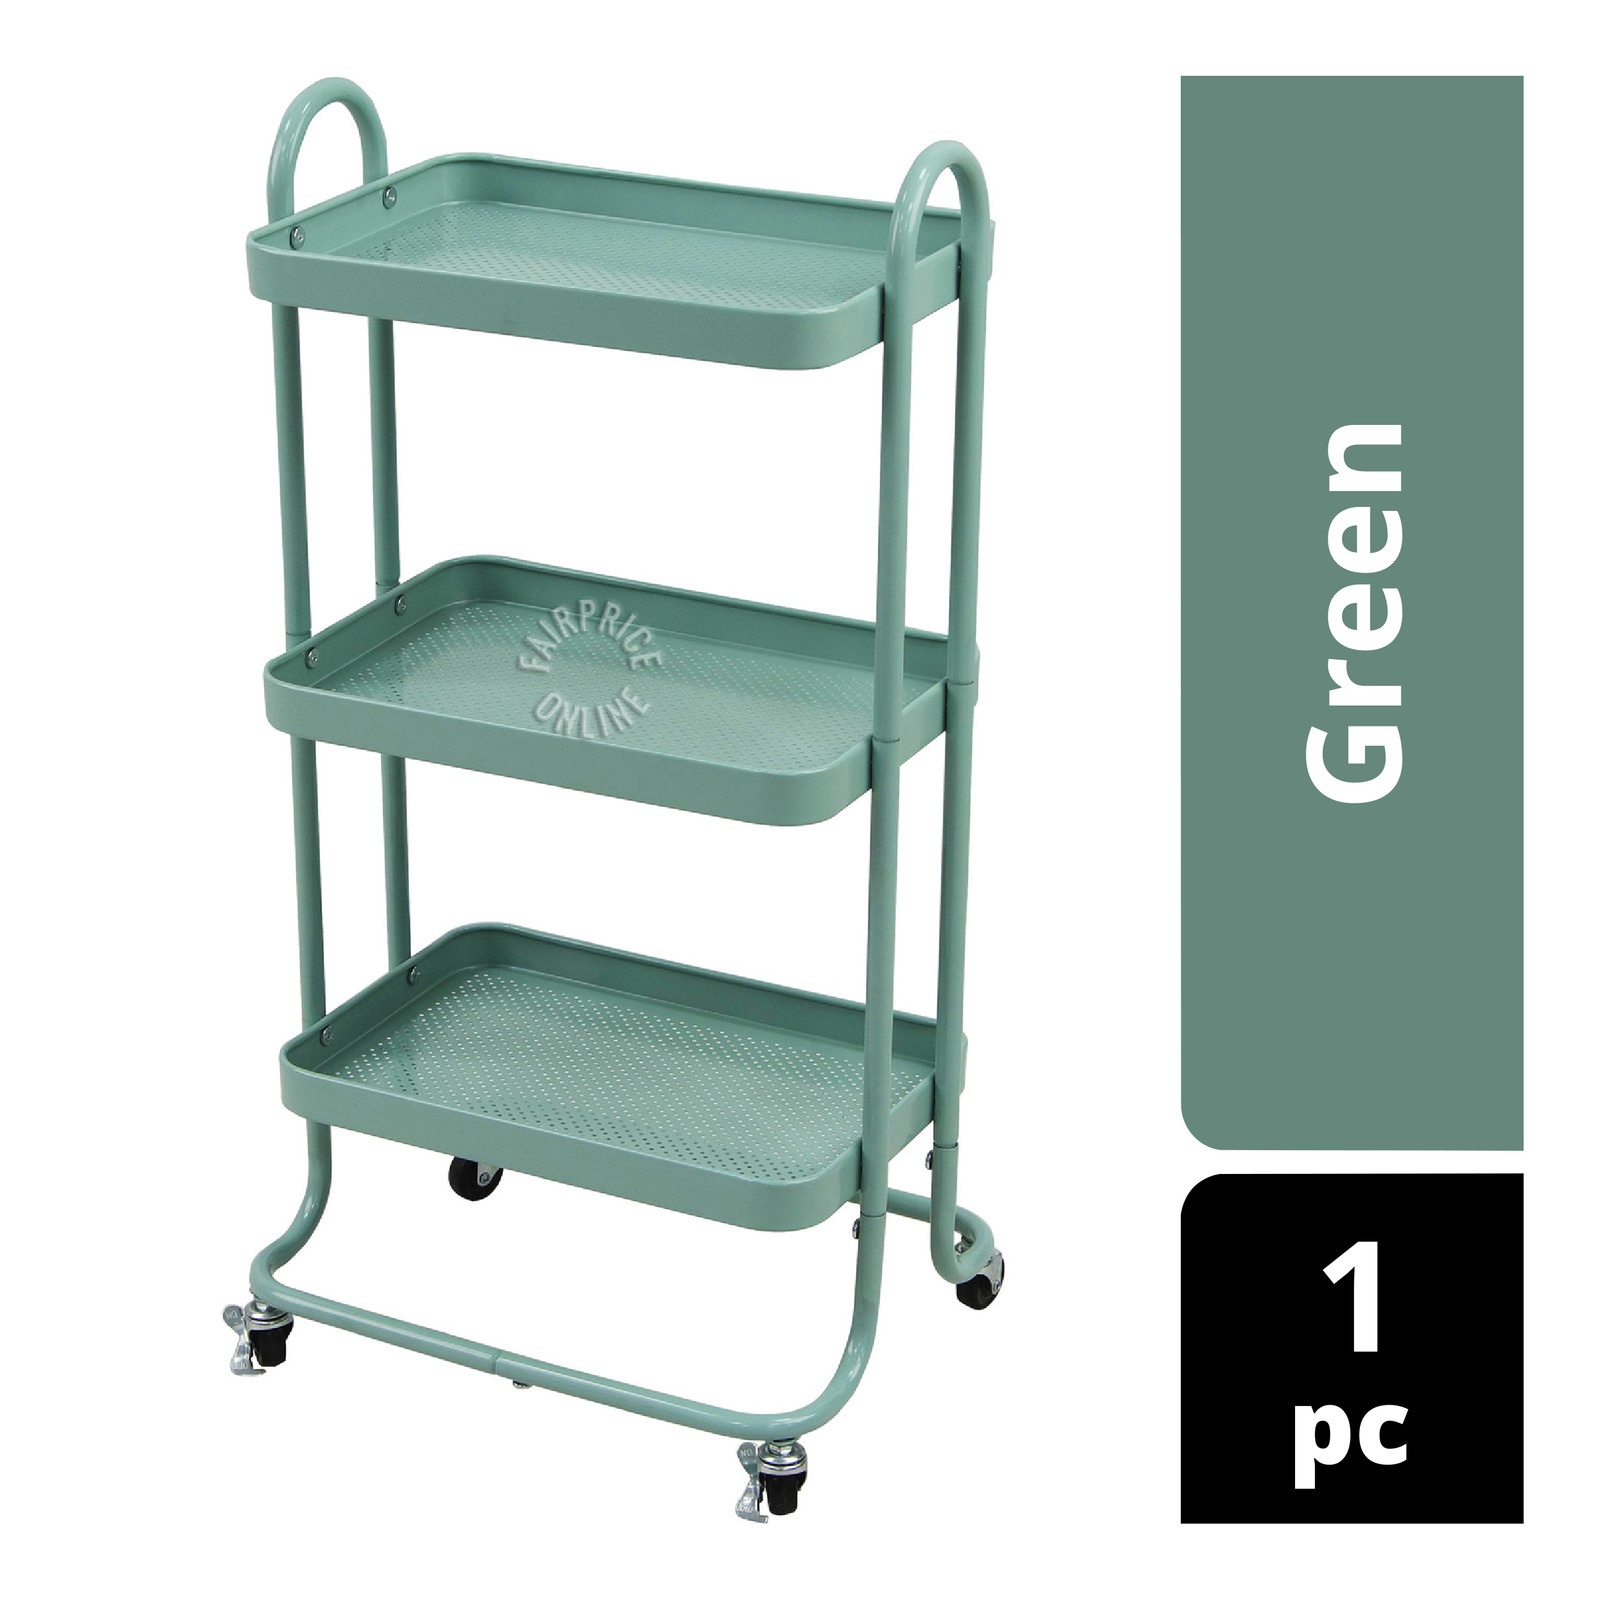 Homeproud Kitchen Trolley - Green